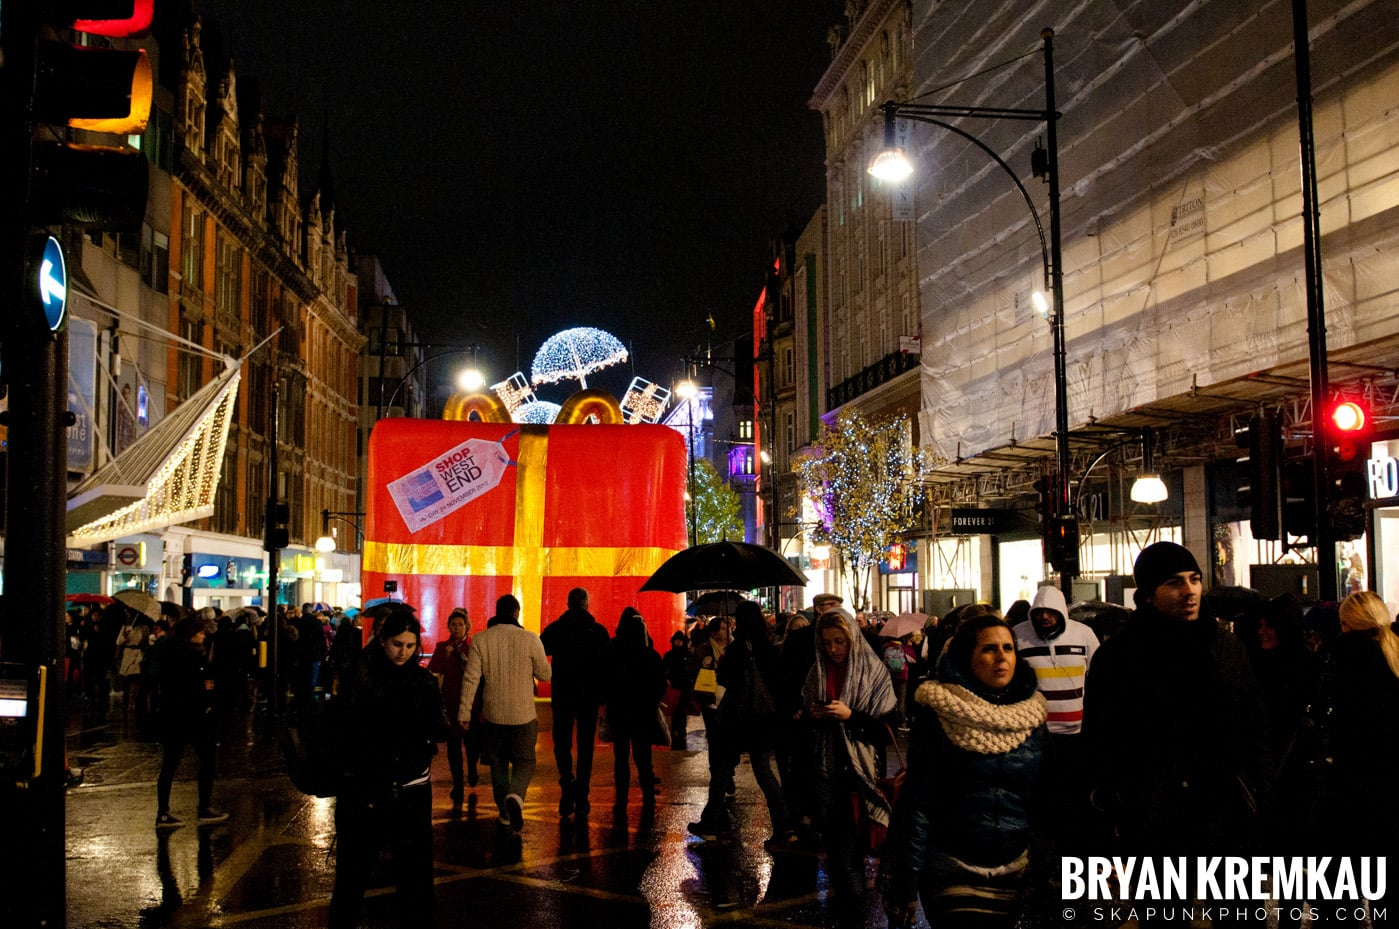 The Levellers @ Shepherds Bush Empire, London UK - 11.24.12 (48)